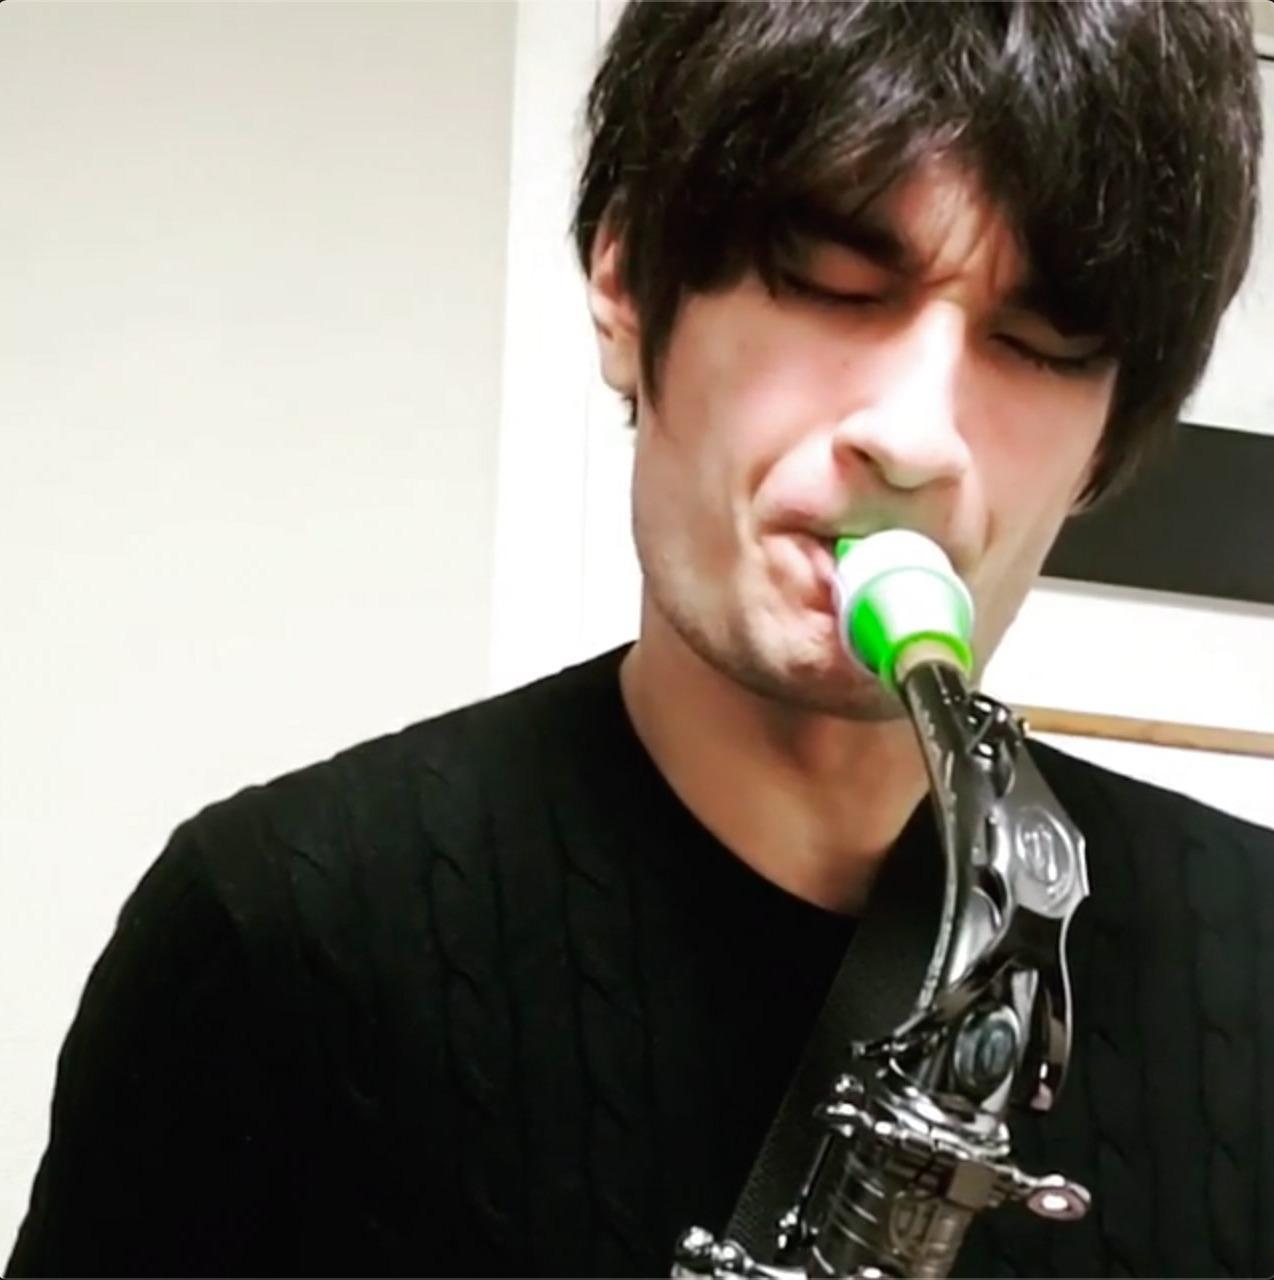 Brian Yasuhiro Seymour plays Syos for alto saxophone